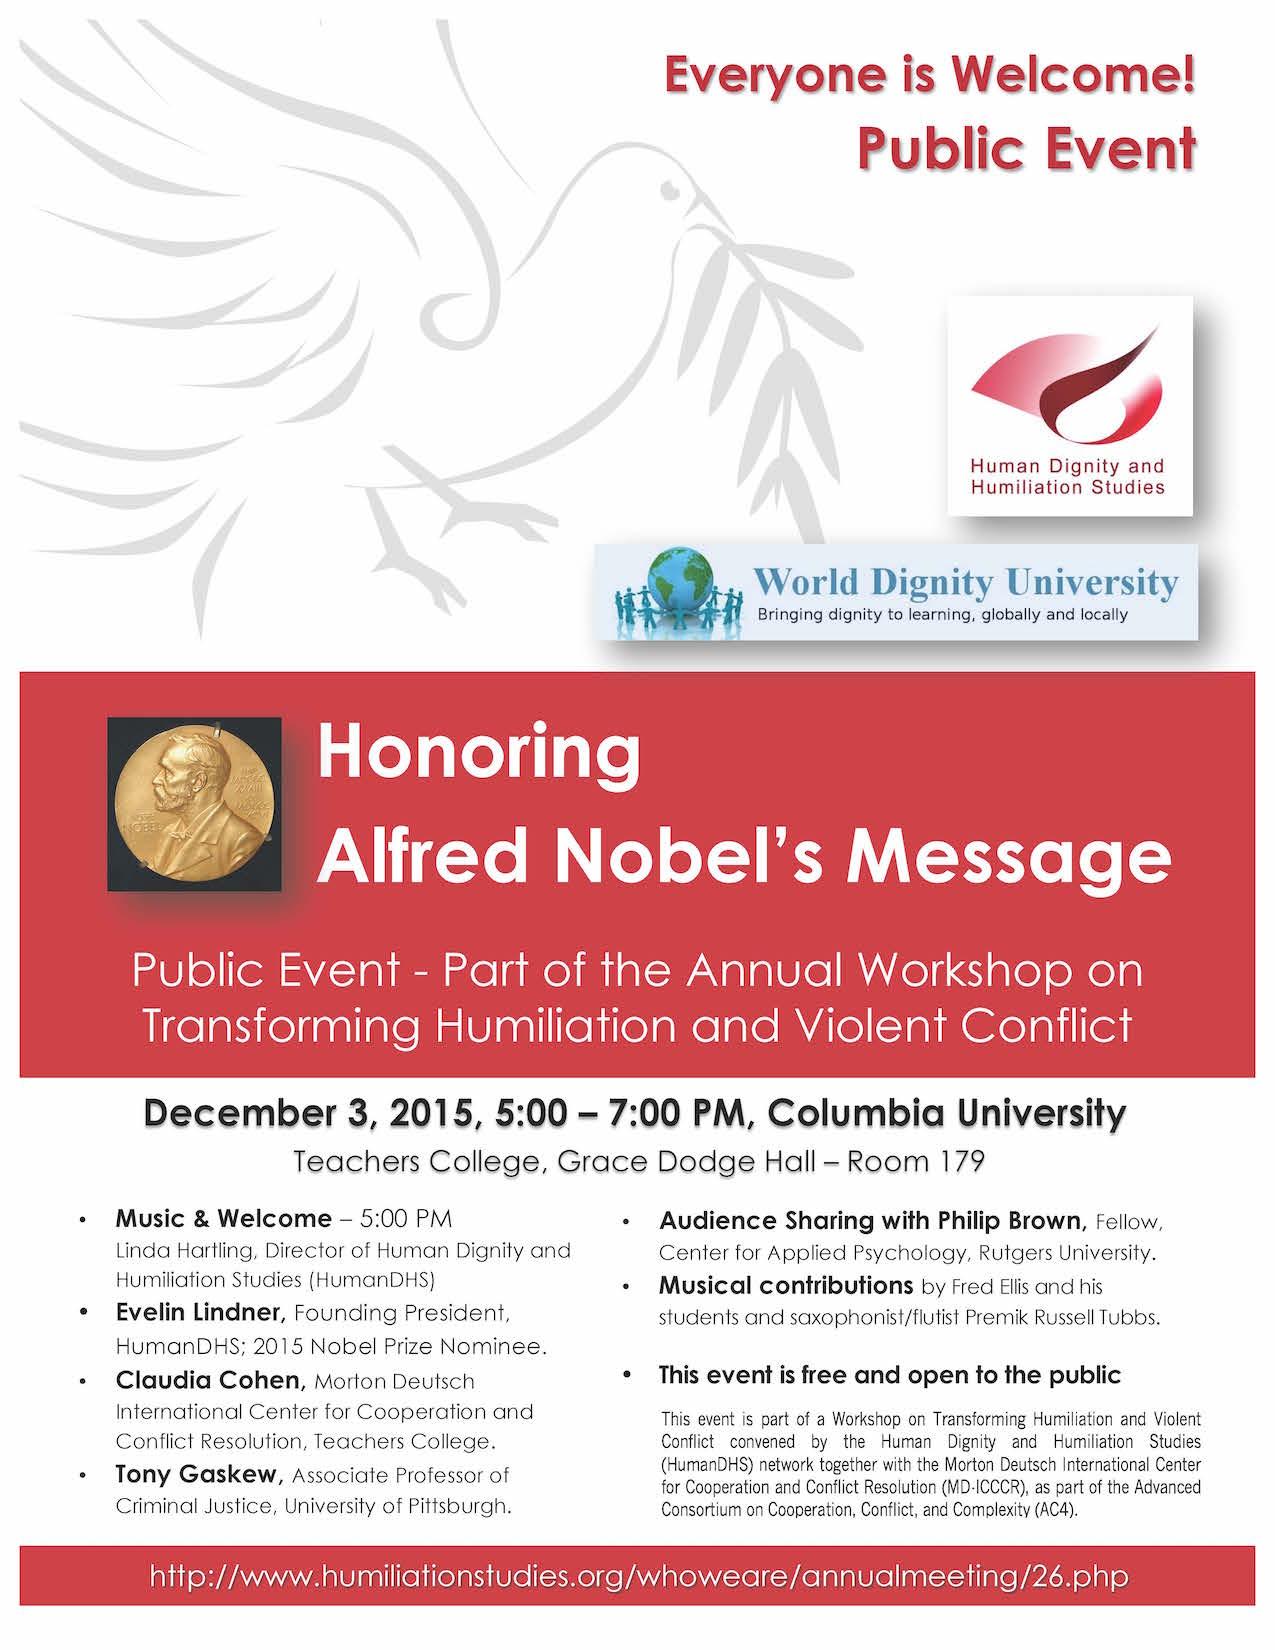 2015 HumanDHS Public Event